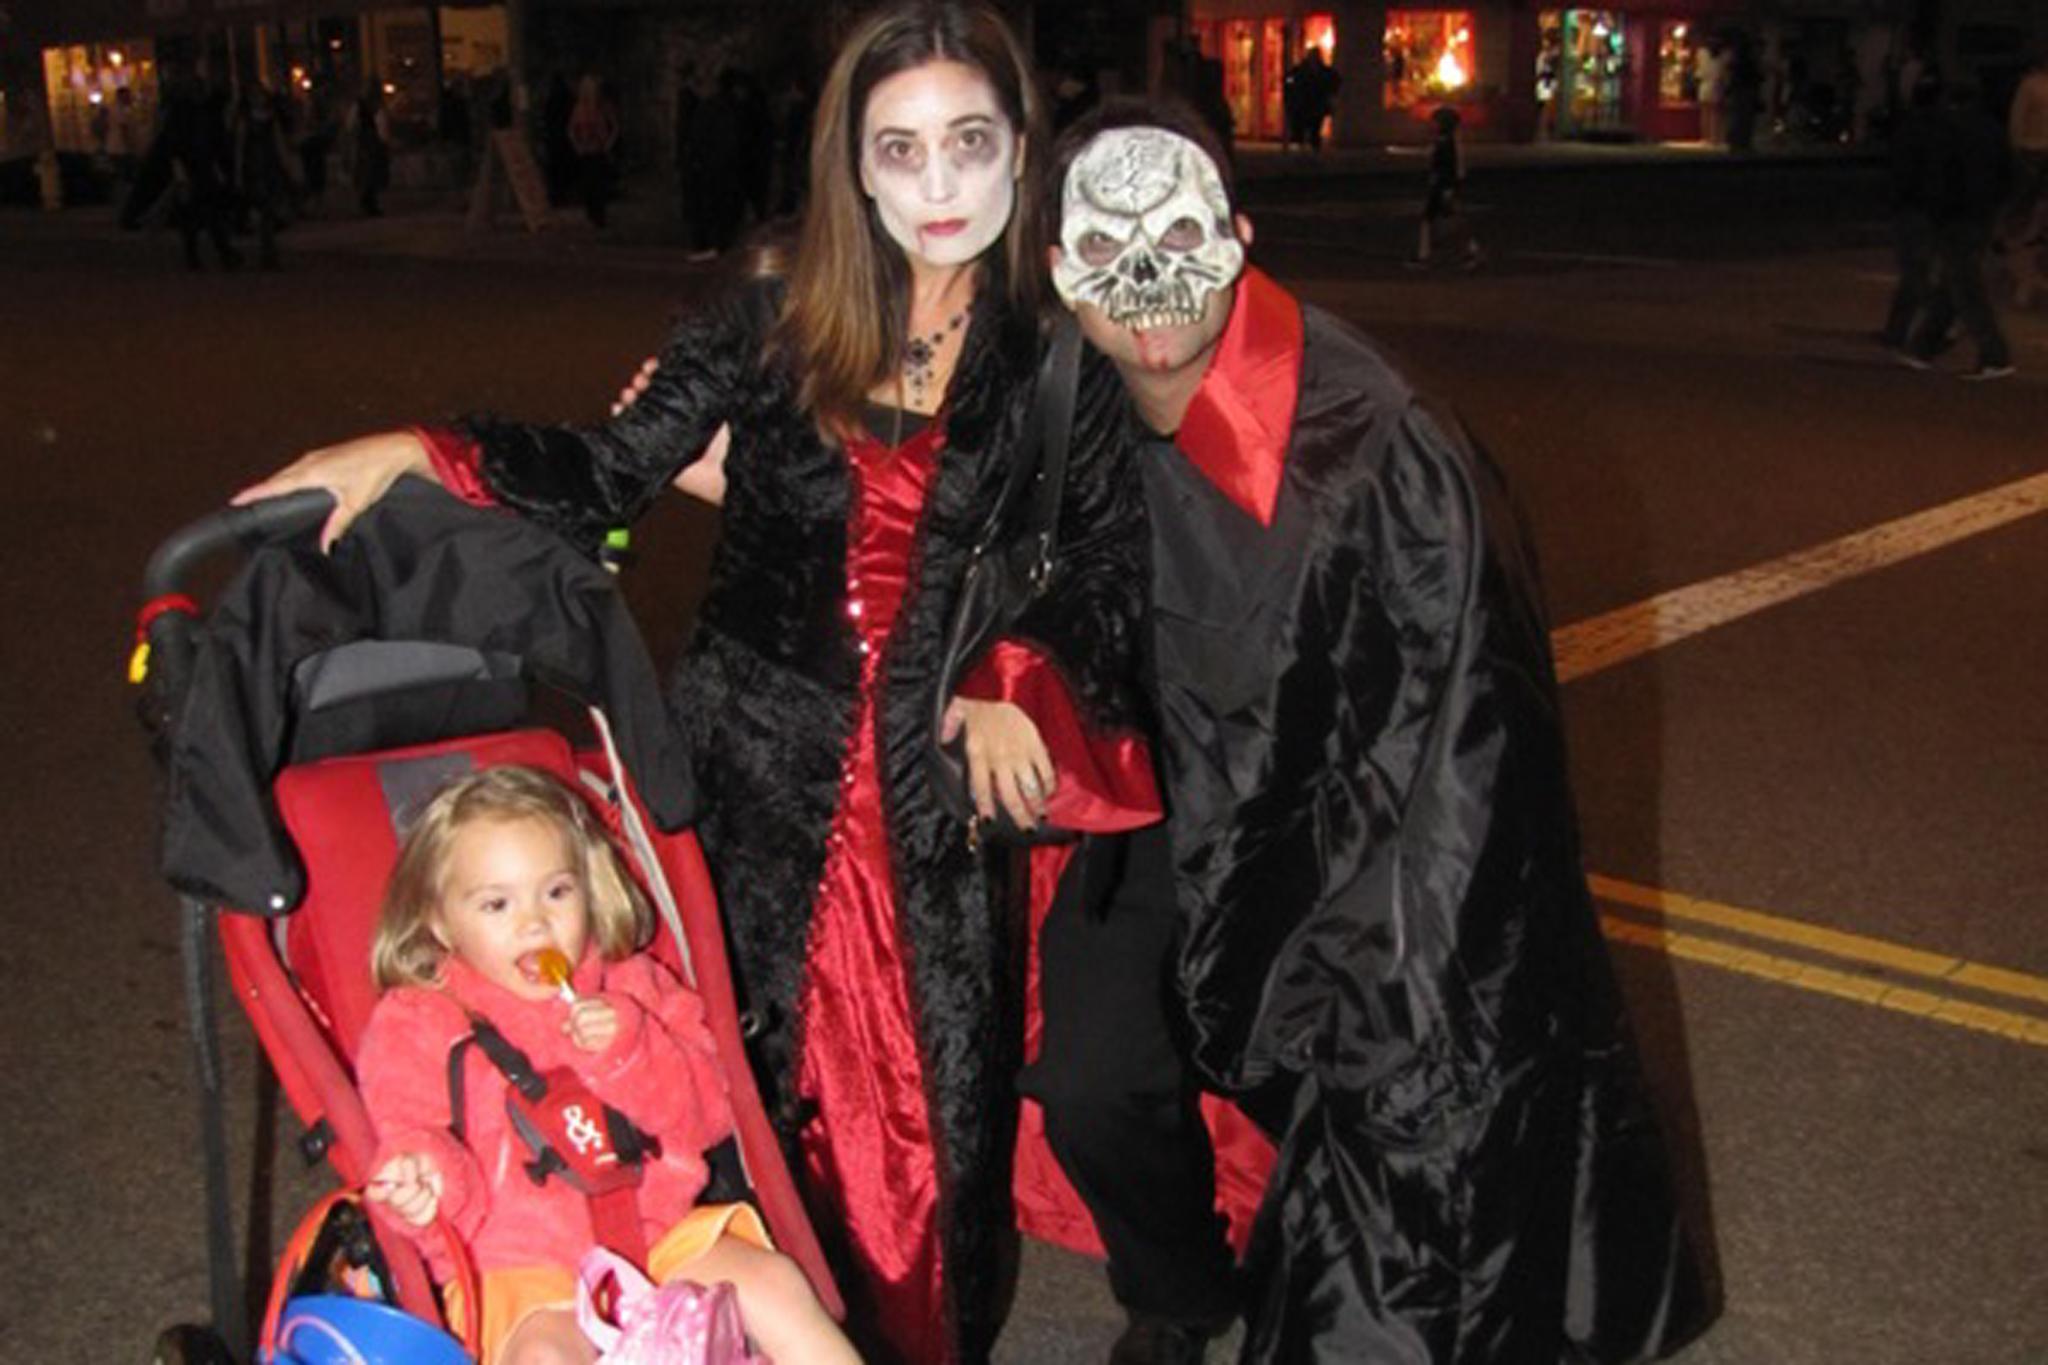 Redondo Beach: The French Riviera Meets Halloween